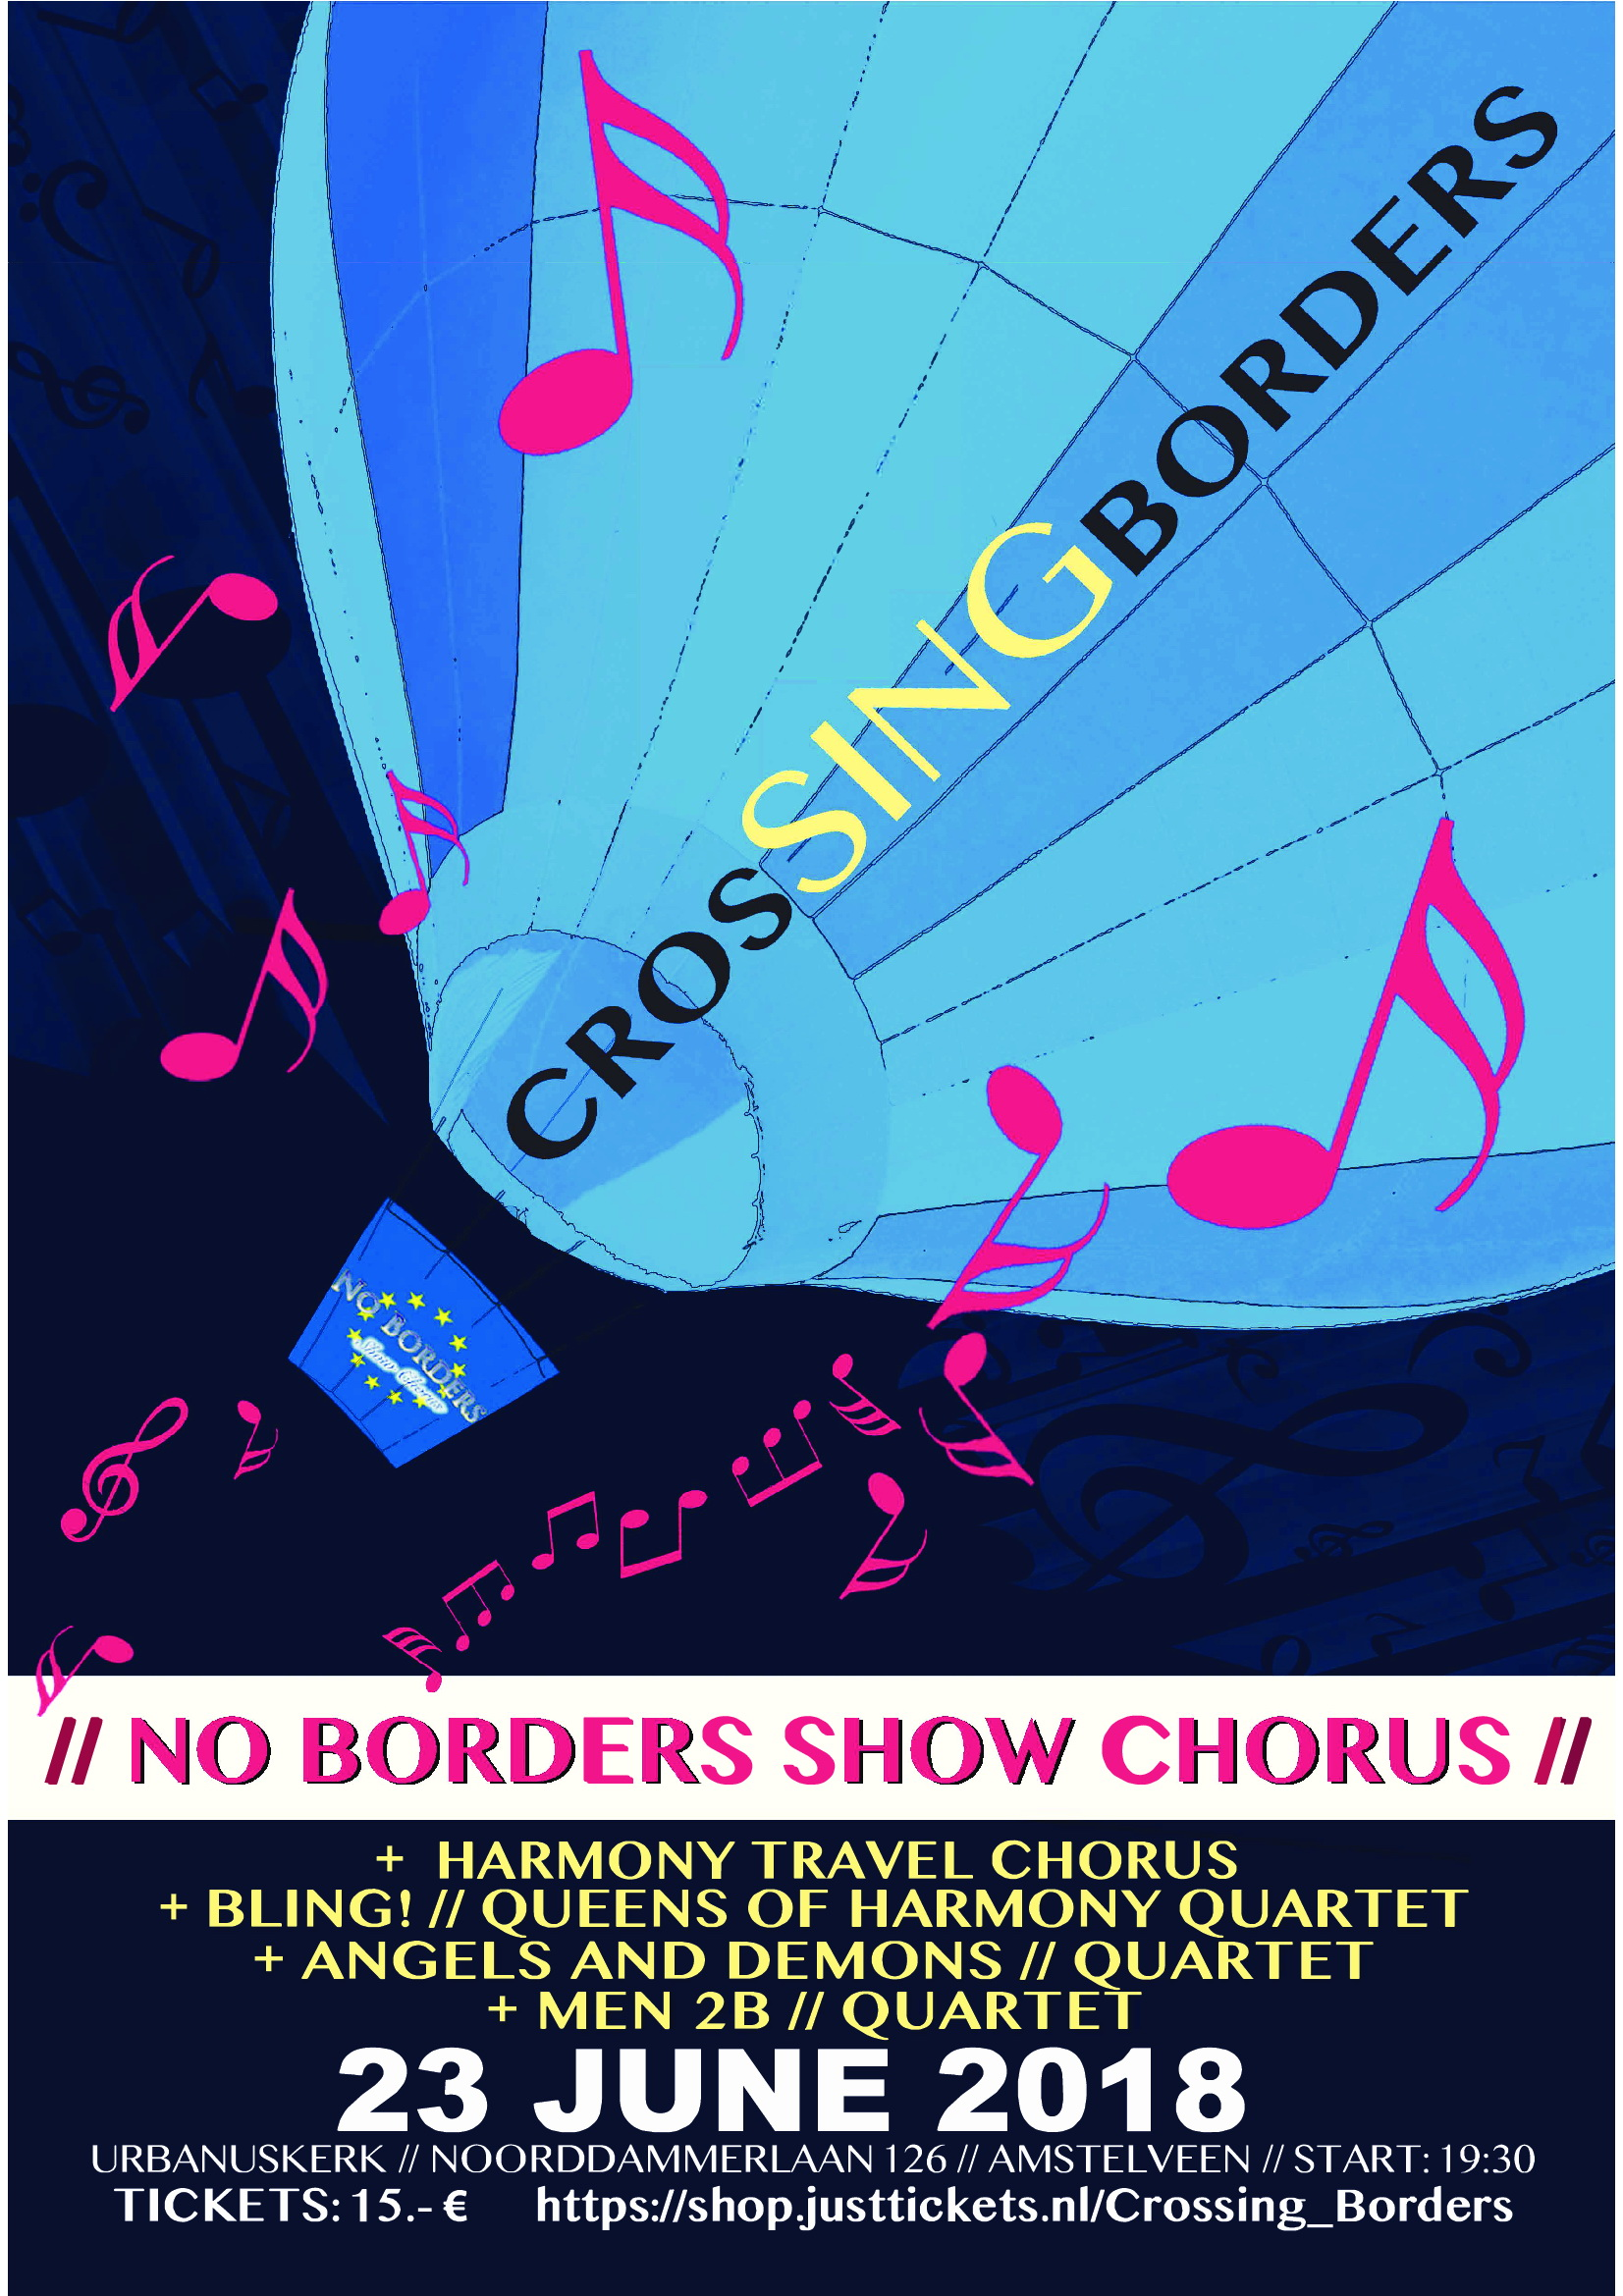 No-Borders-show Urbanuskerk